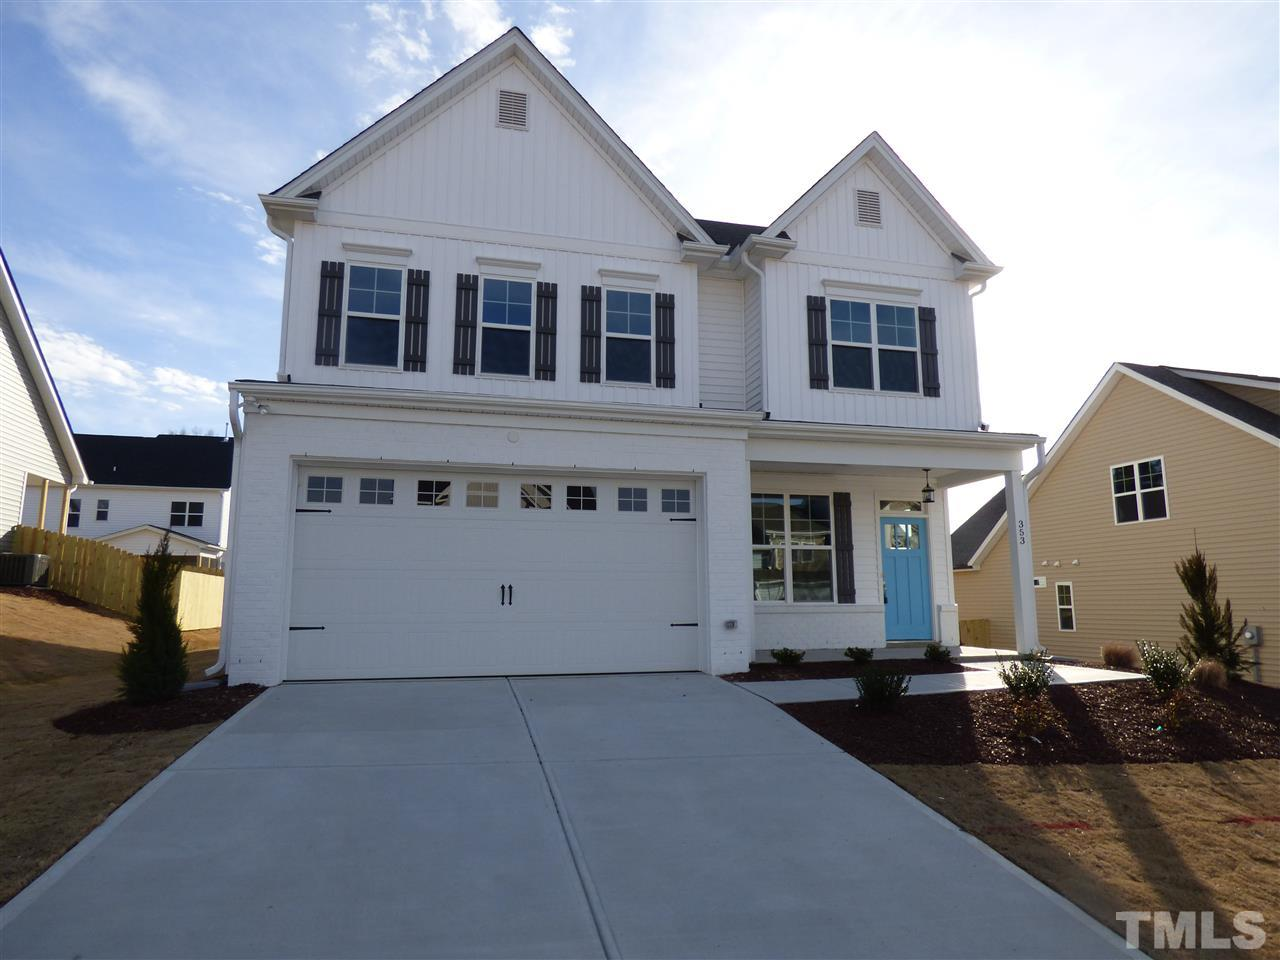 353 Cascade Hills Lane, The Bluffs at Joyner Park, Wake Forest NC (Homesite 21) - $300,000